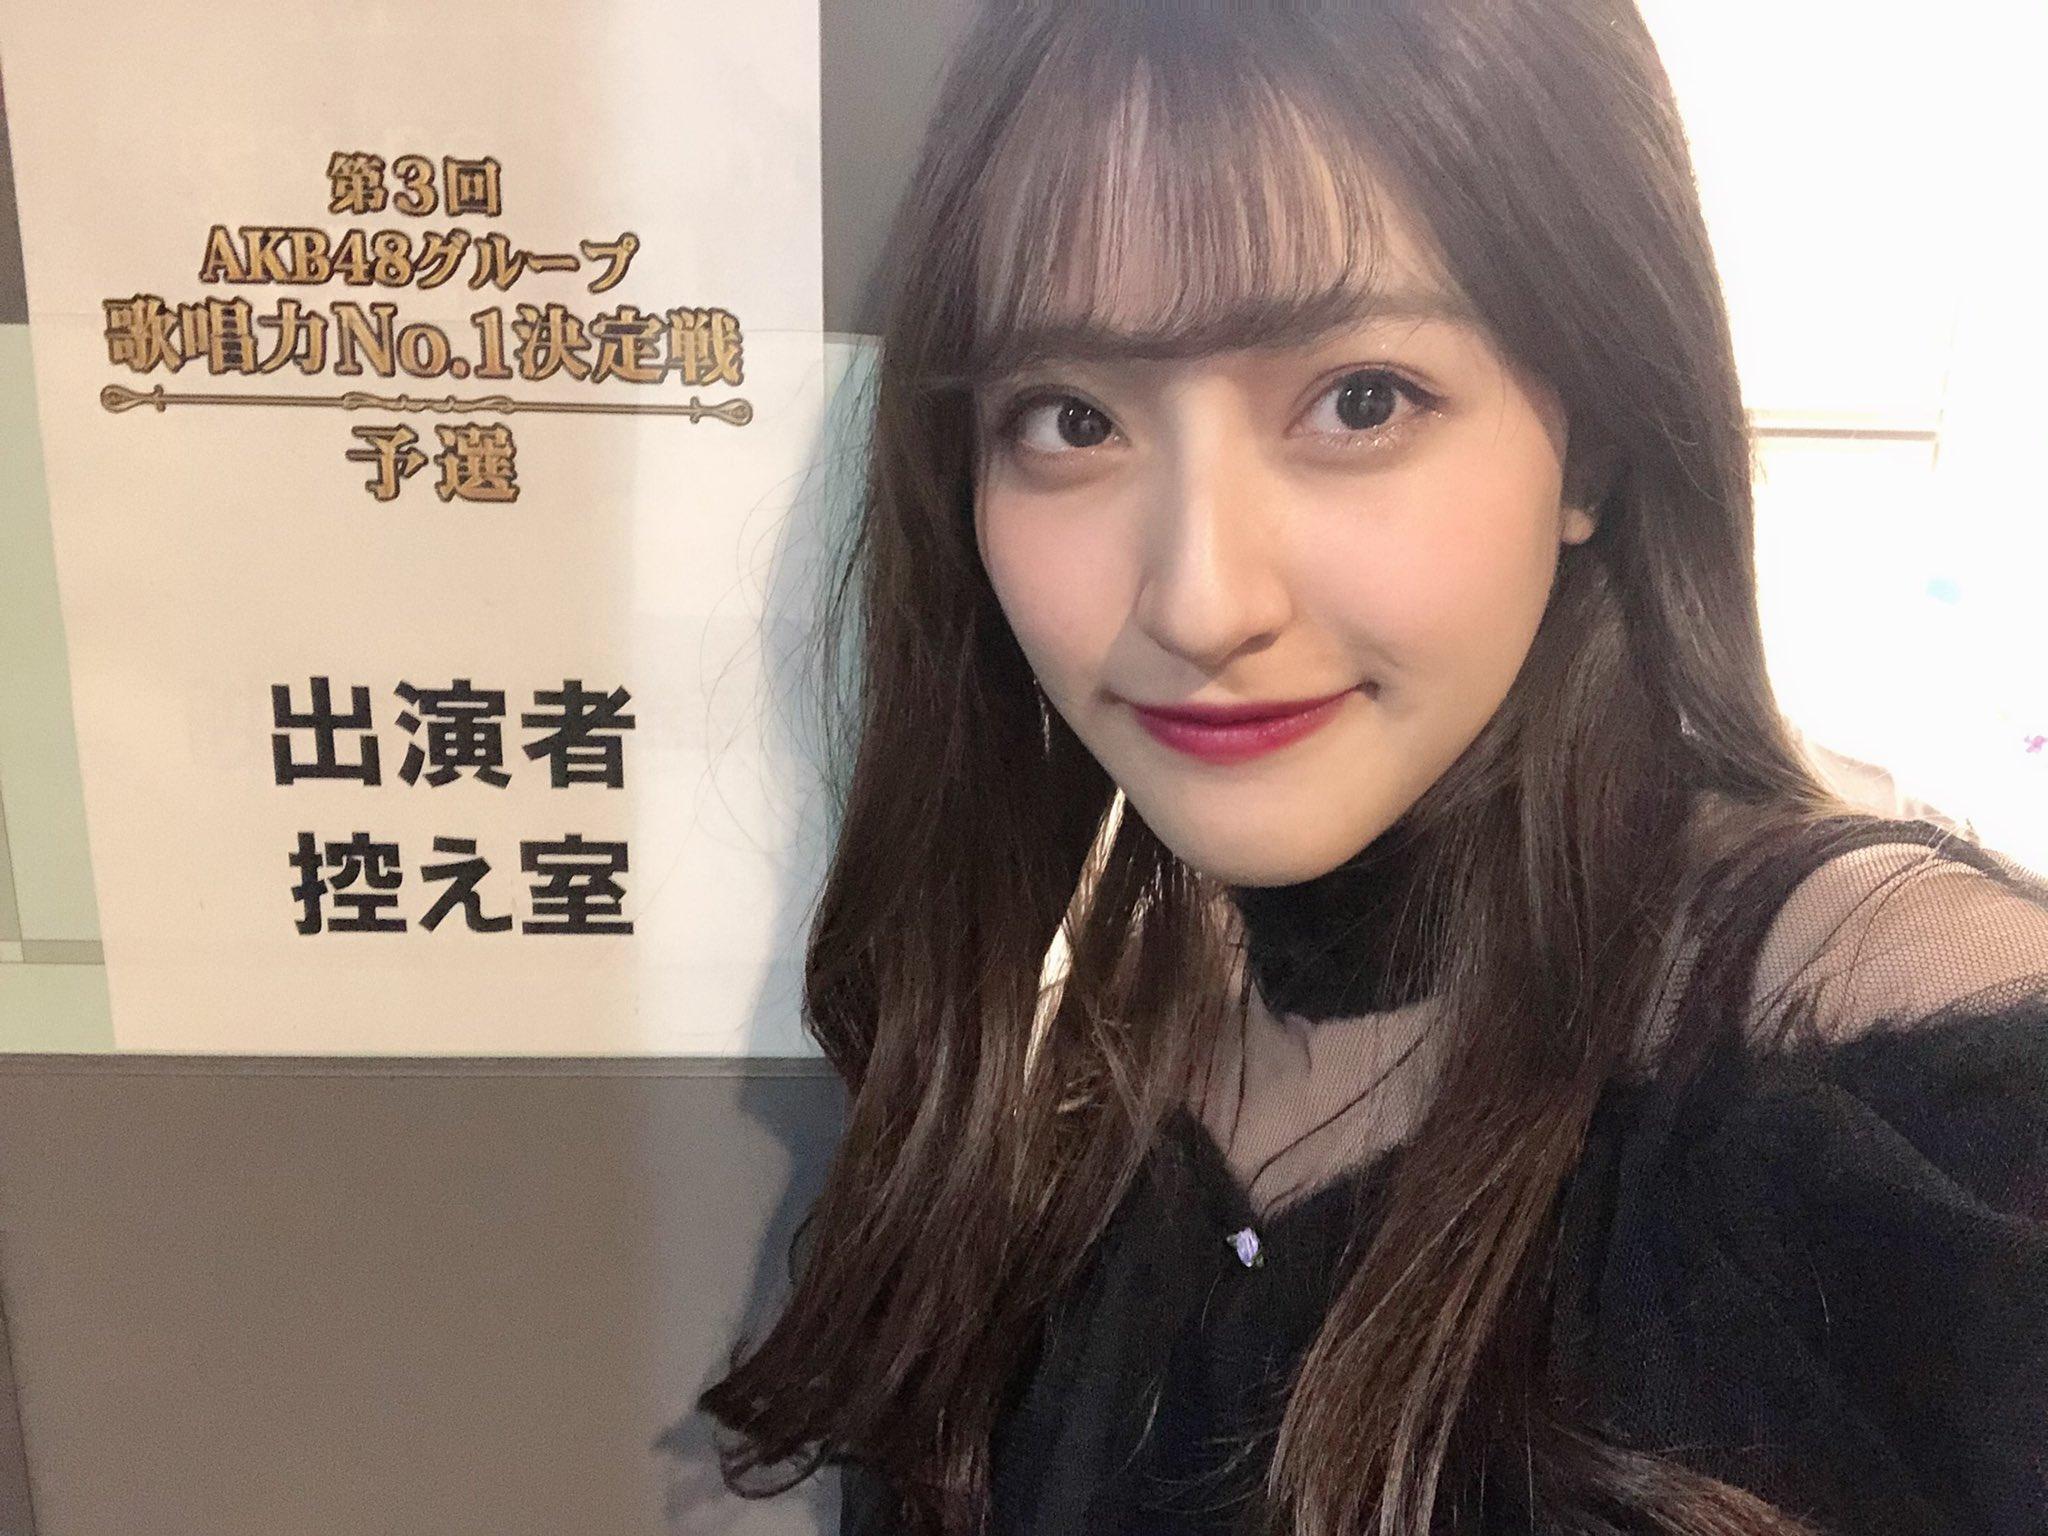 【NMB48】AKB48歌唱力No1決定戦の予選収録に出場メンバーが参加